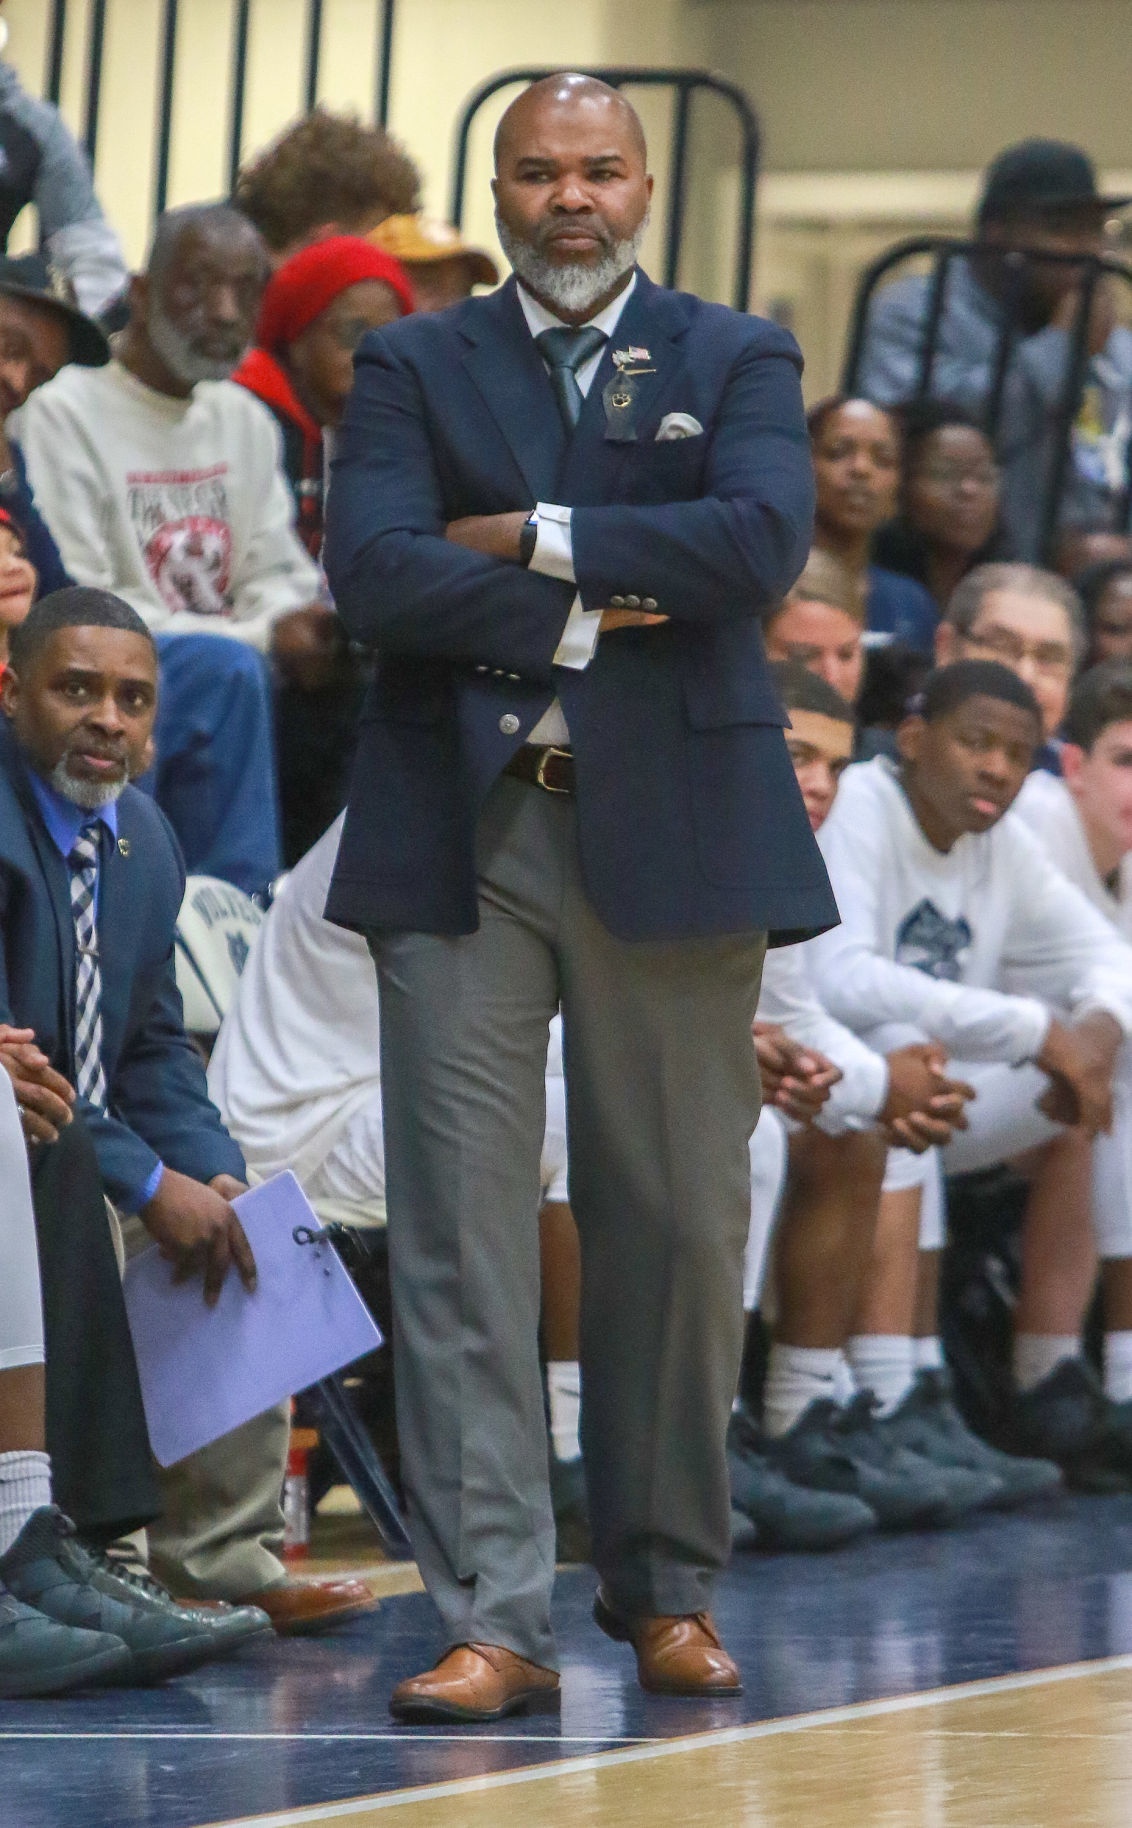 Boys basketball - West Side at Michigan City (BNI)